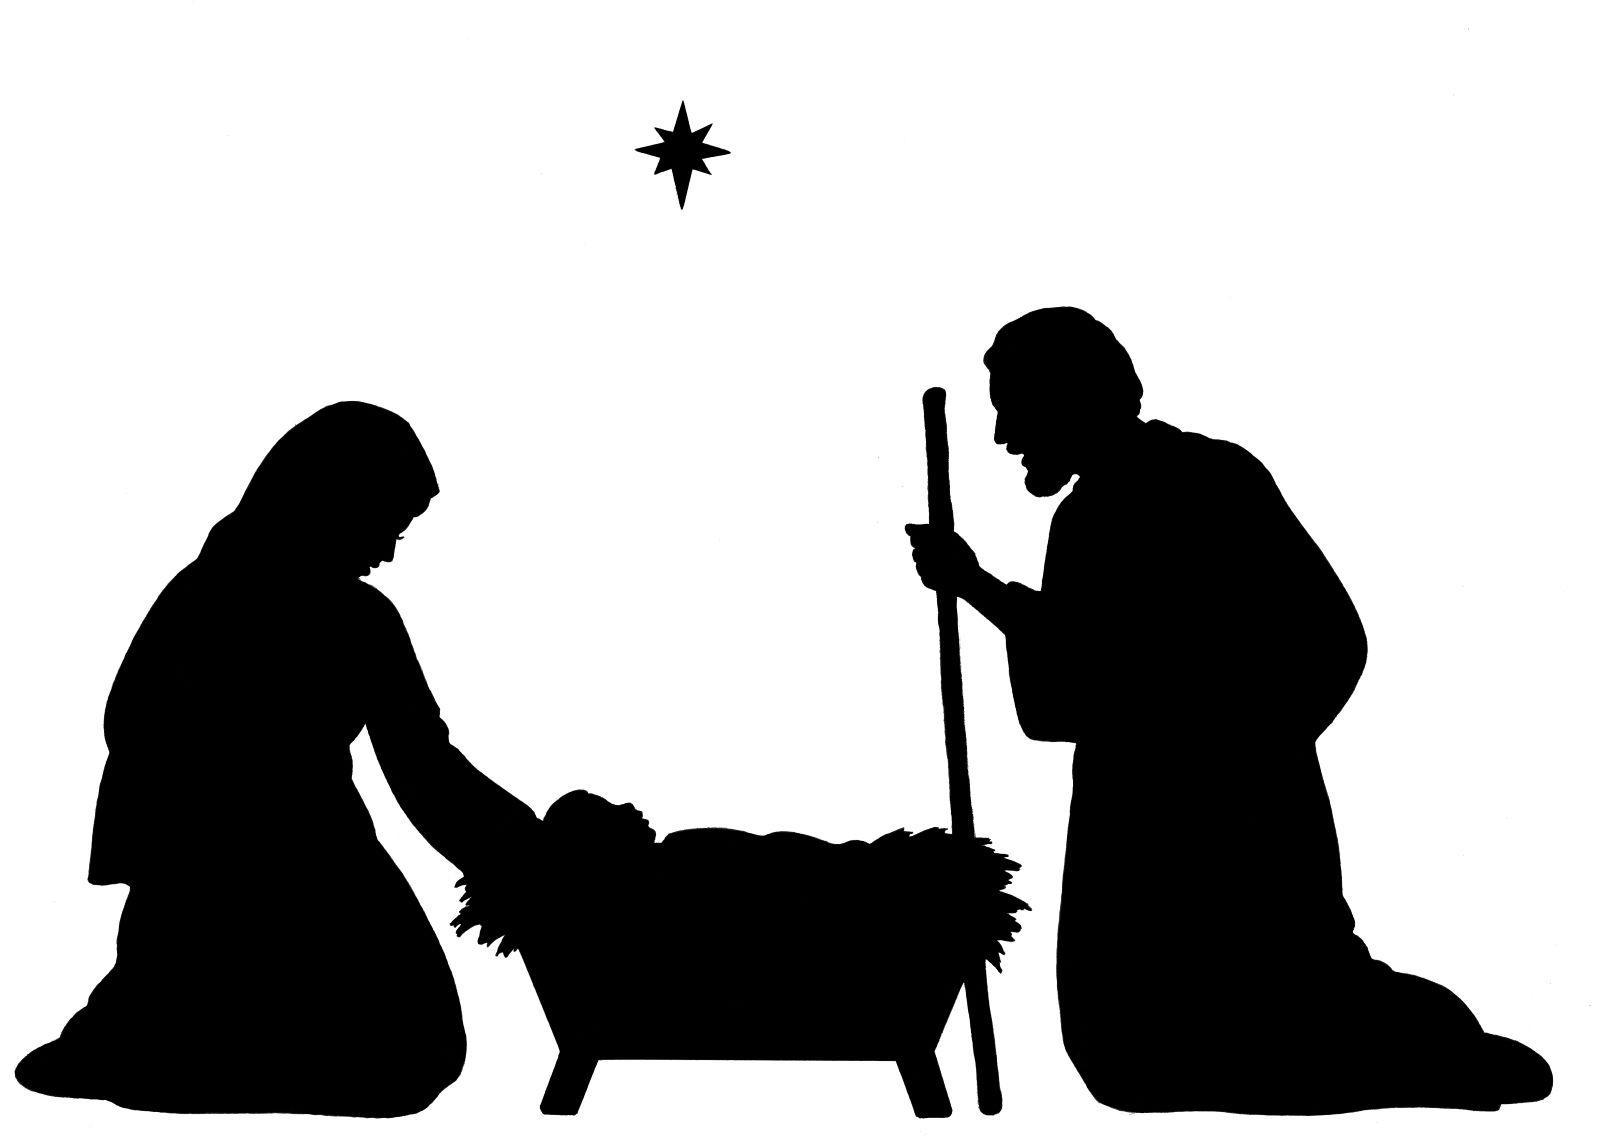 HD Nativity Stable Clip Art Design » Free Vector Art, Images.